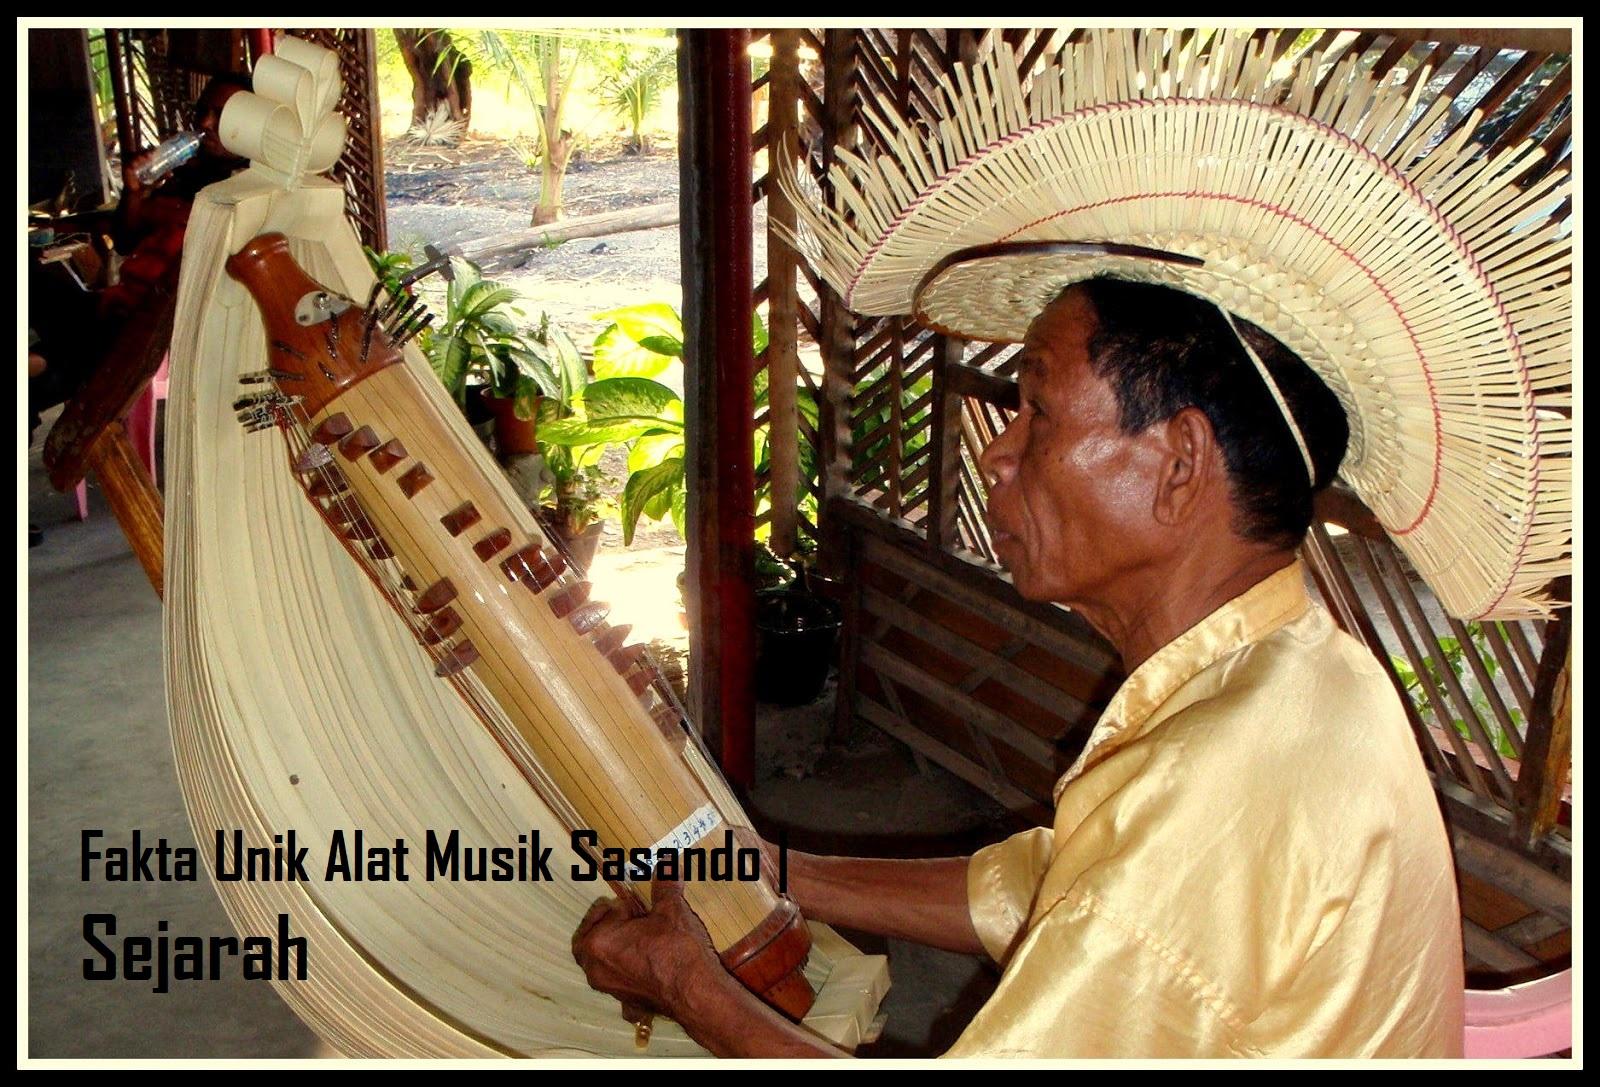 Fakta Unik Alat Musik Sasando Sejarah